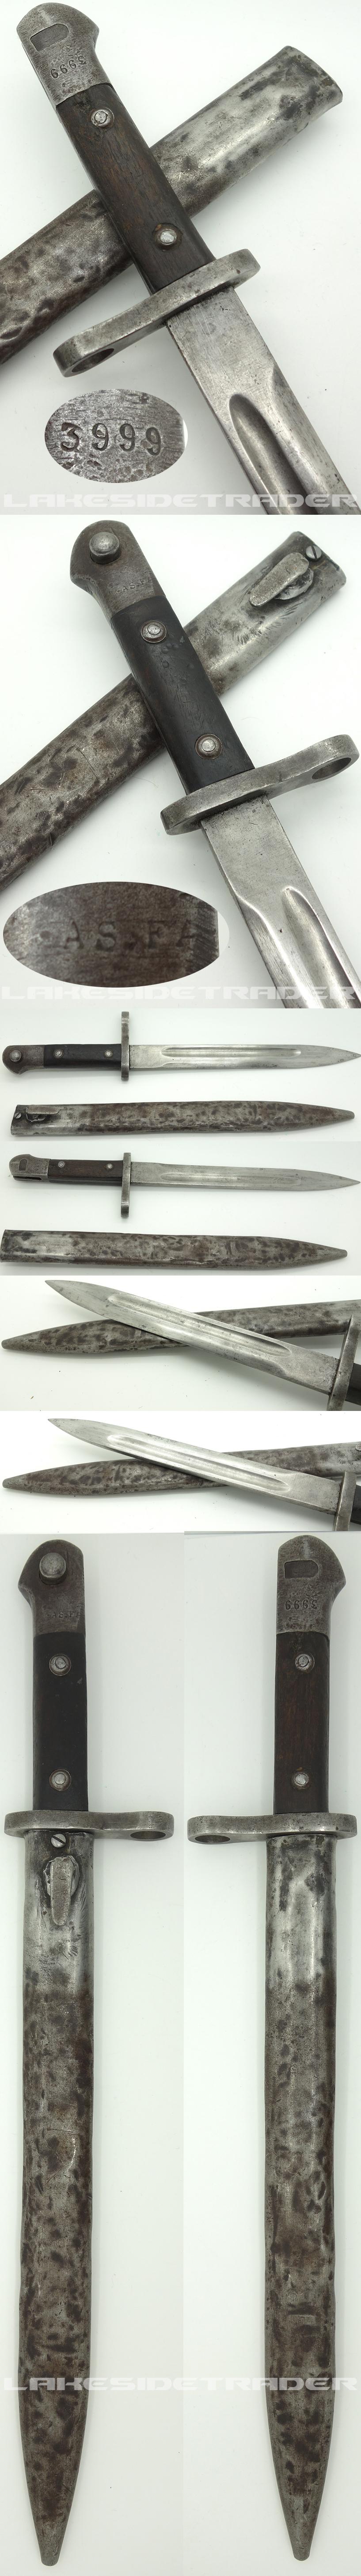 Turkish M35 Bayonet by Askari Fabrika